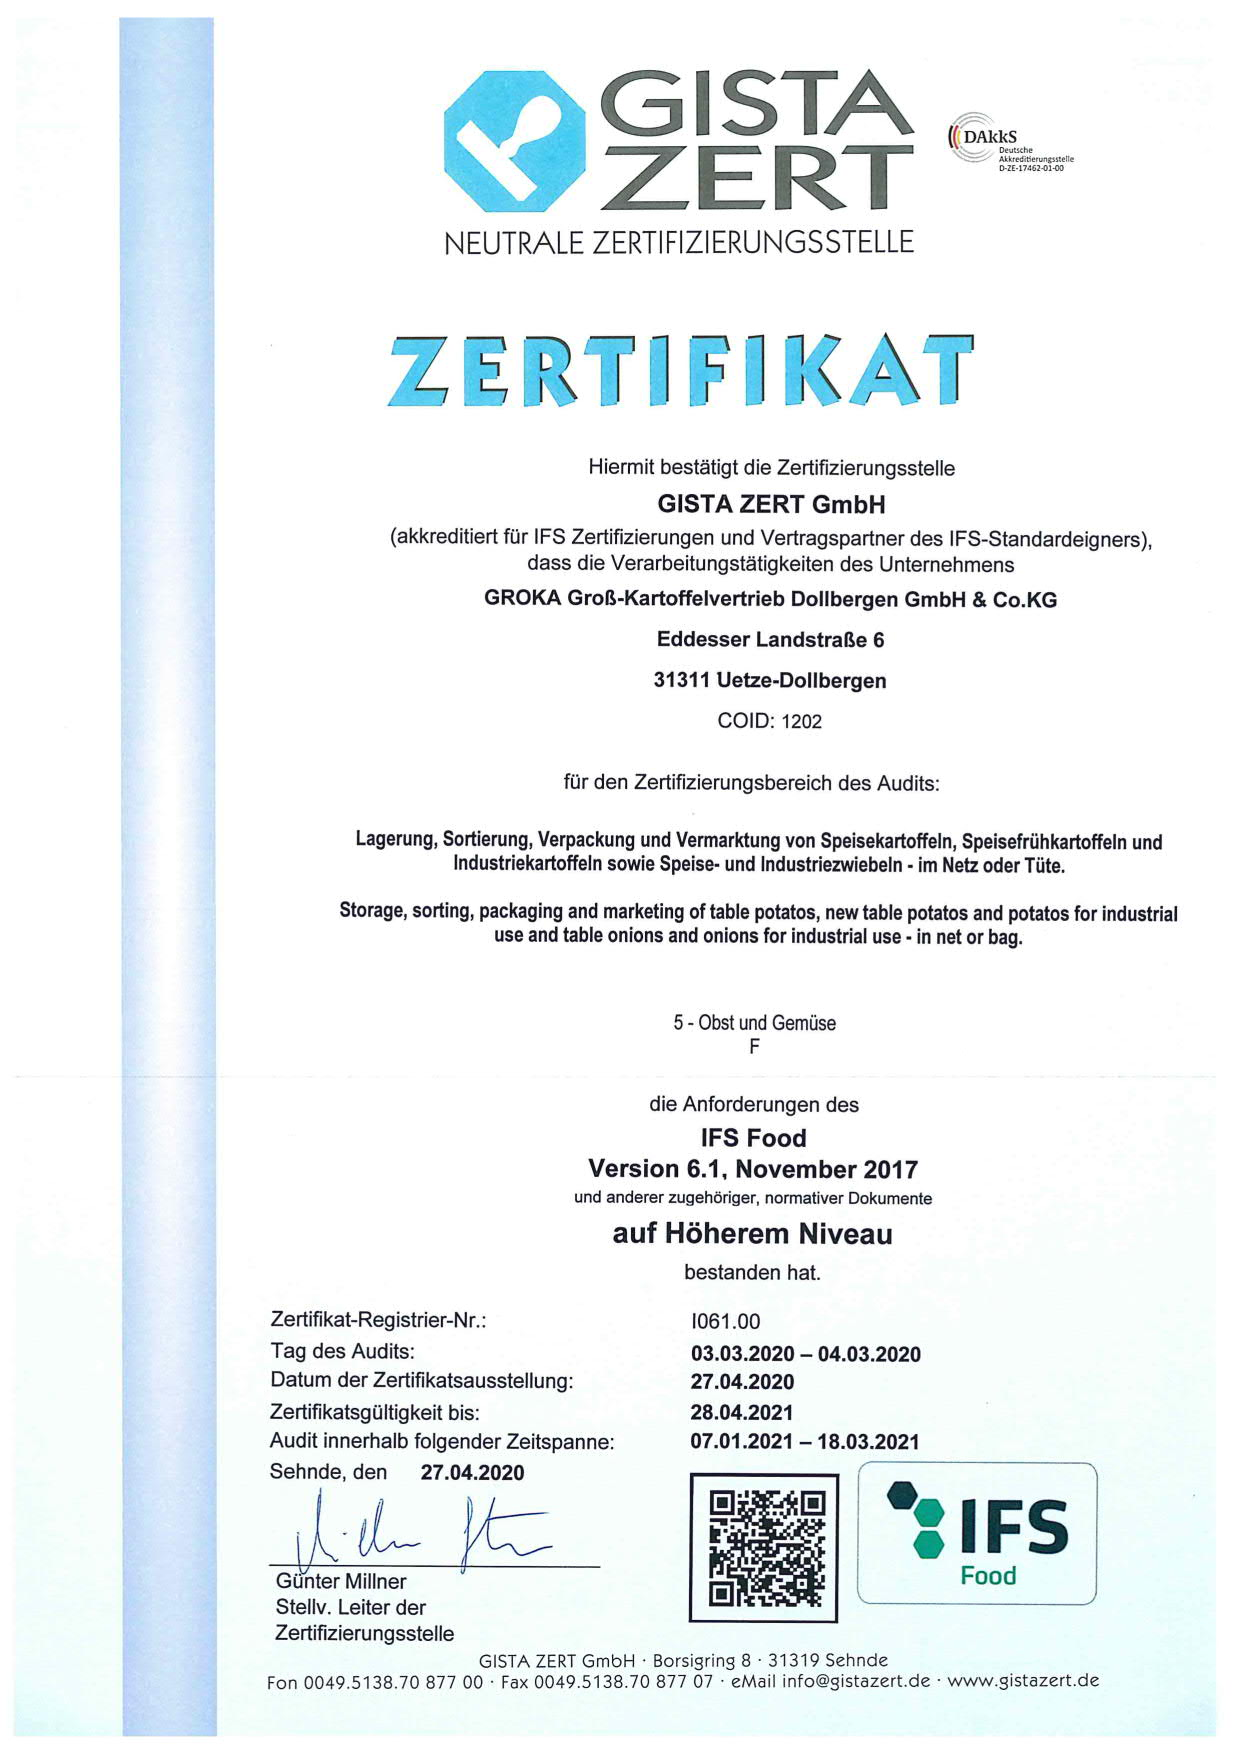 Zertifikate/Zertifikat_IFS_Groka_2020.jpg